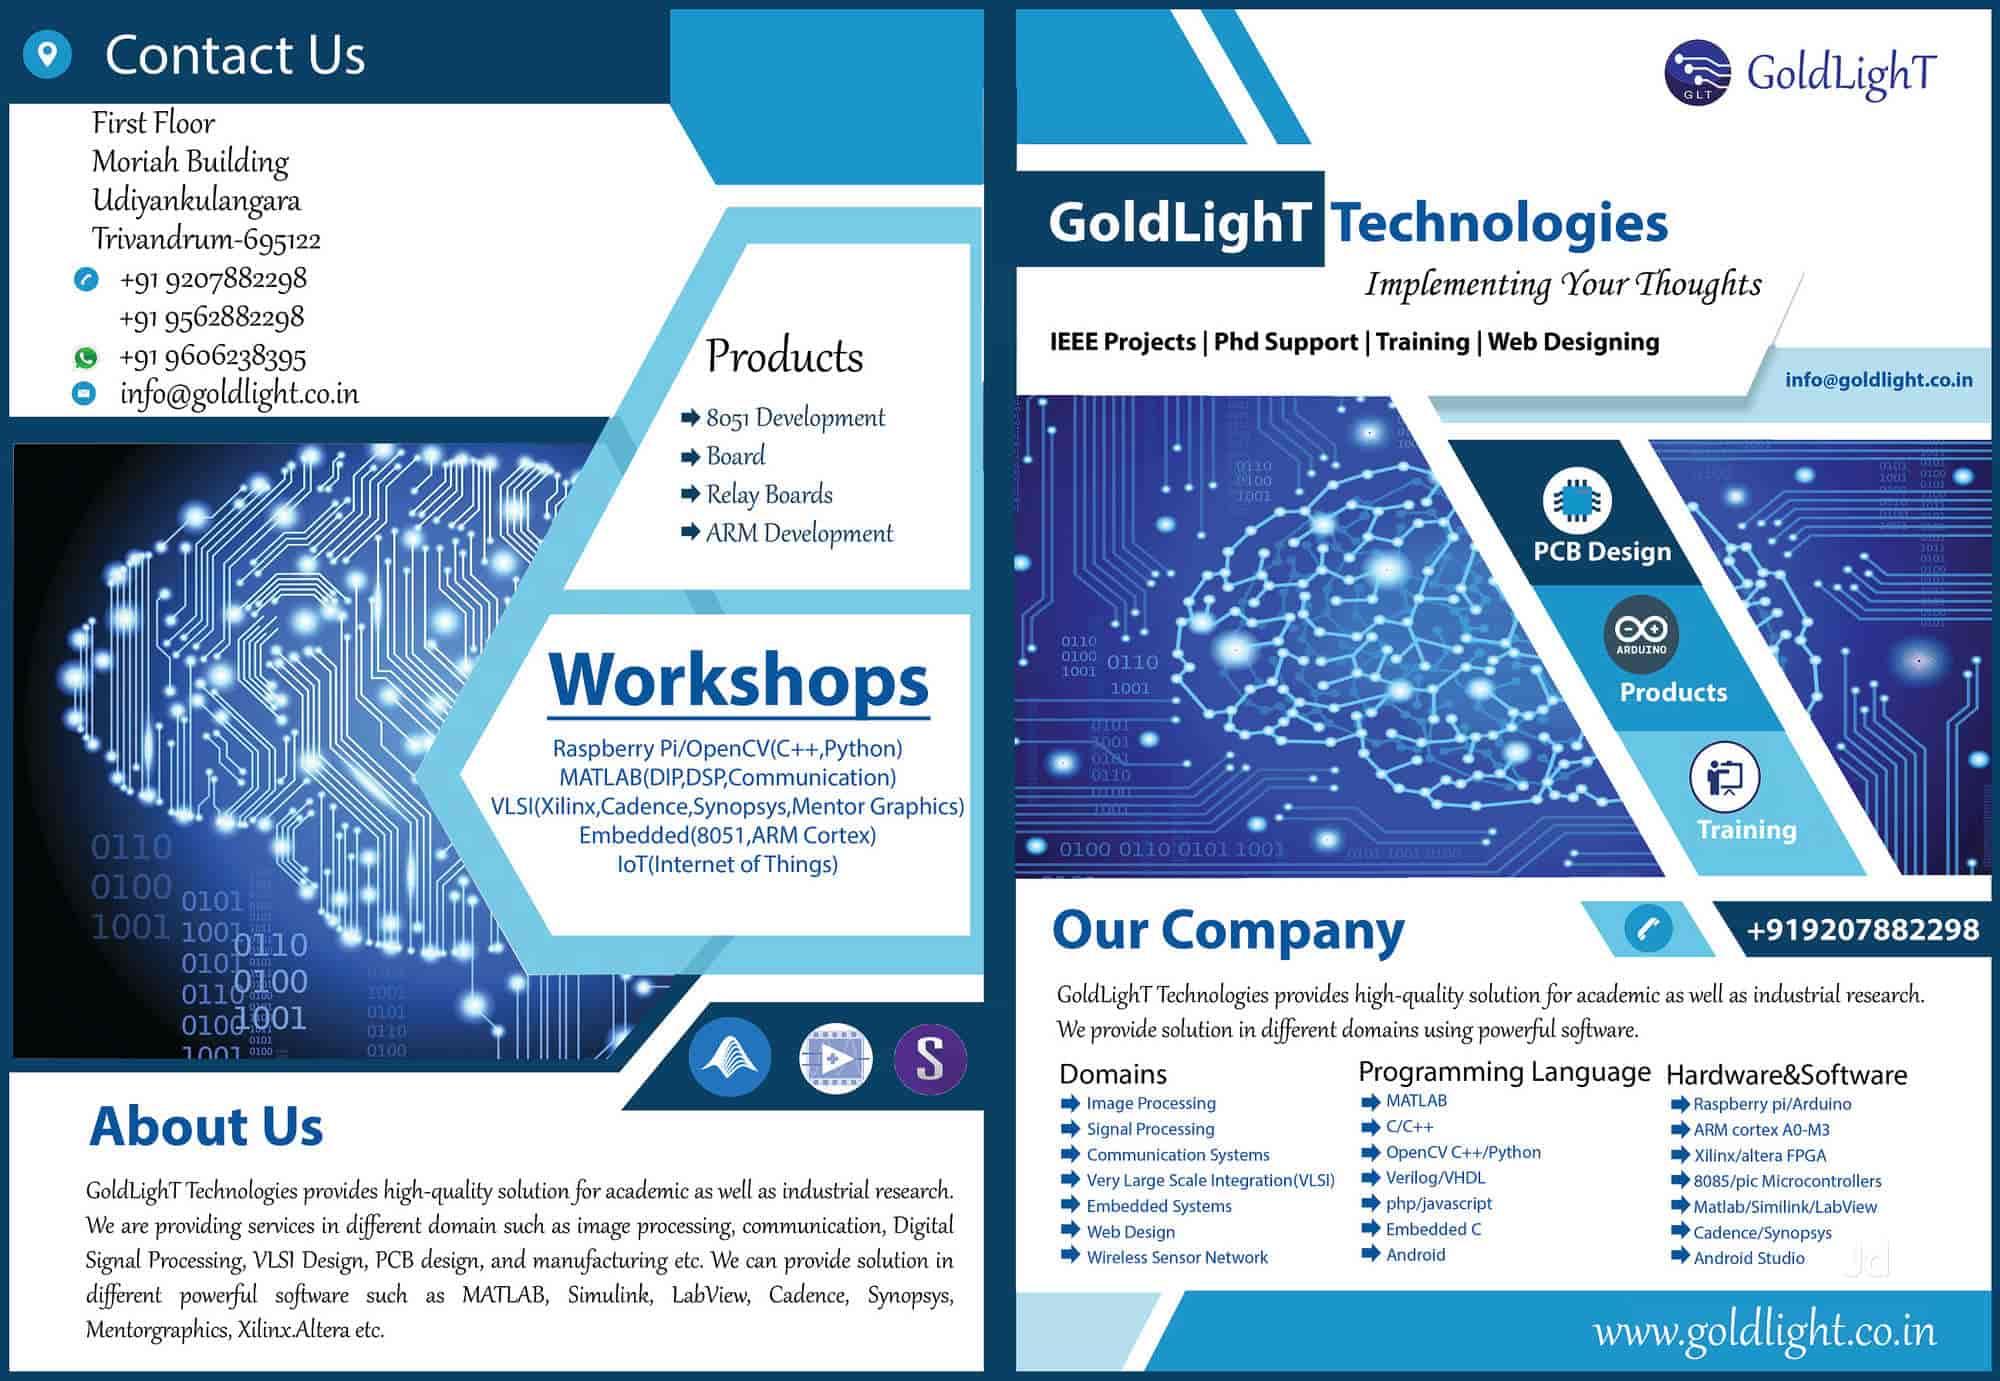 Goldlight Technologies, Udiyankulangara - Computer Training